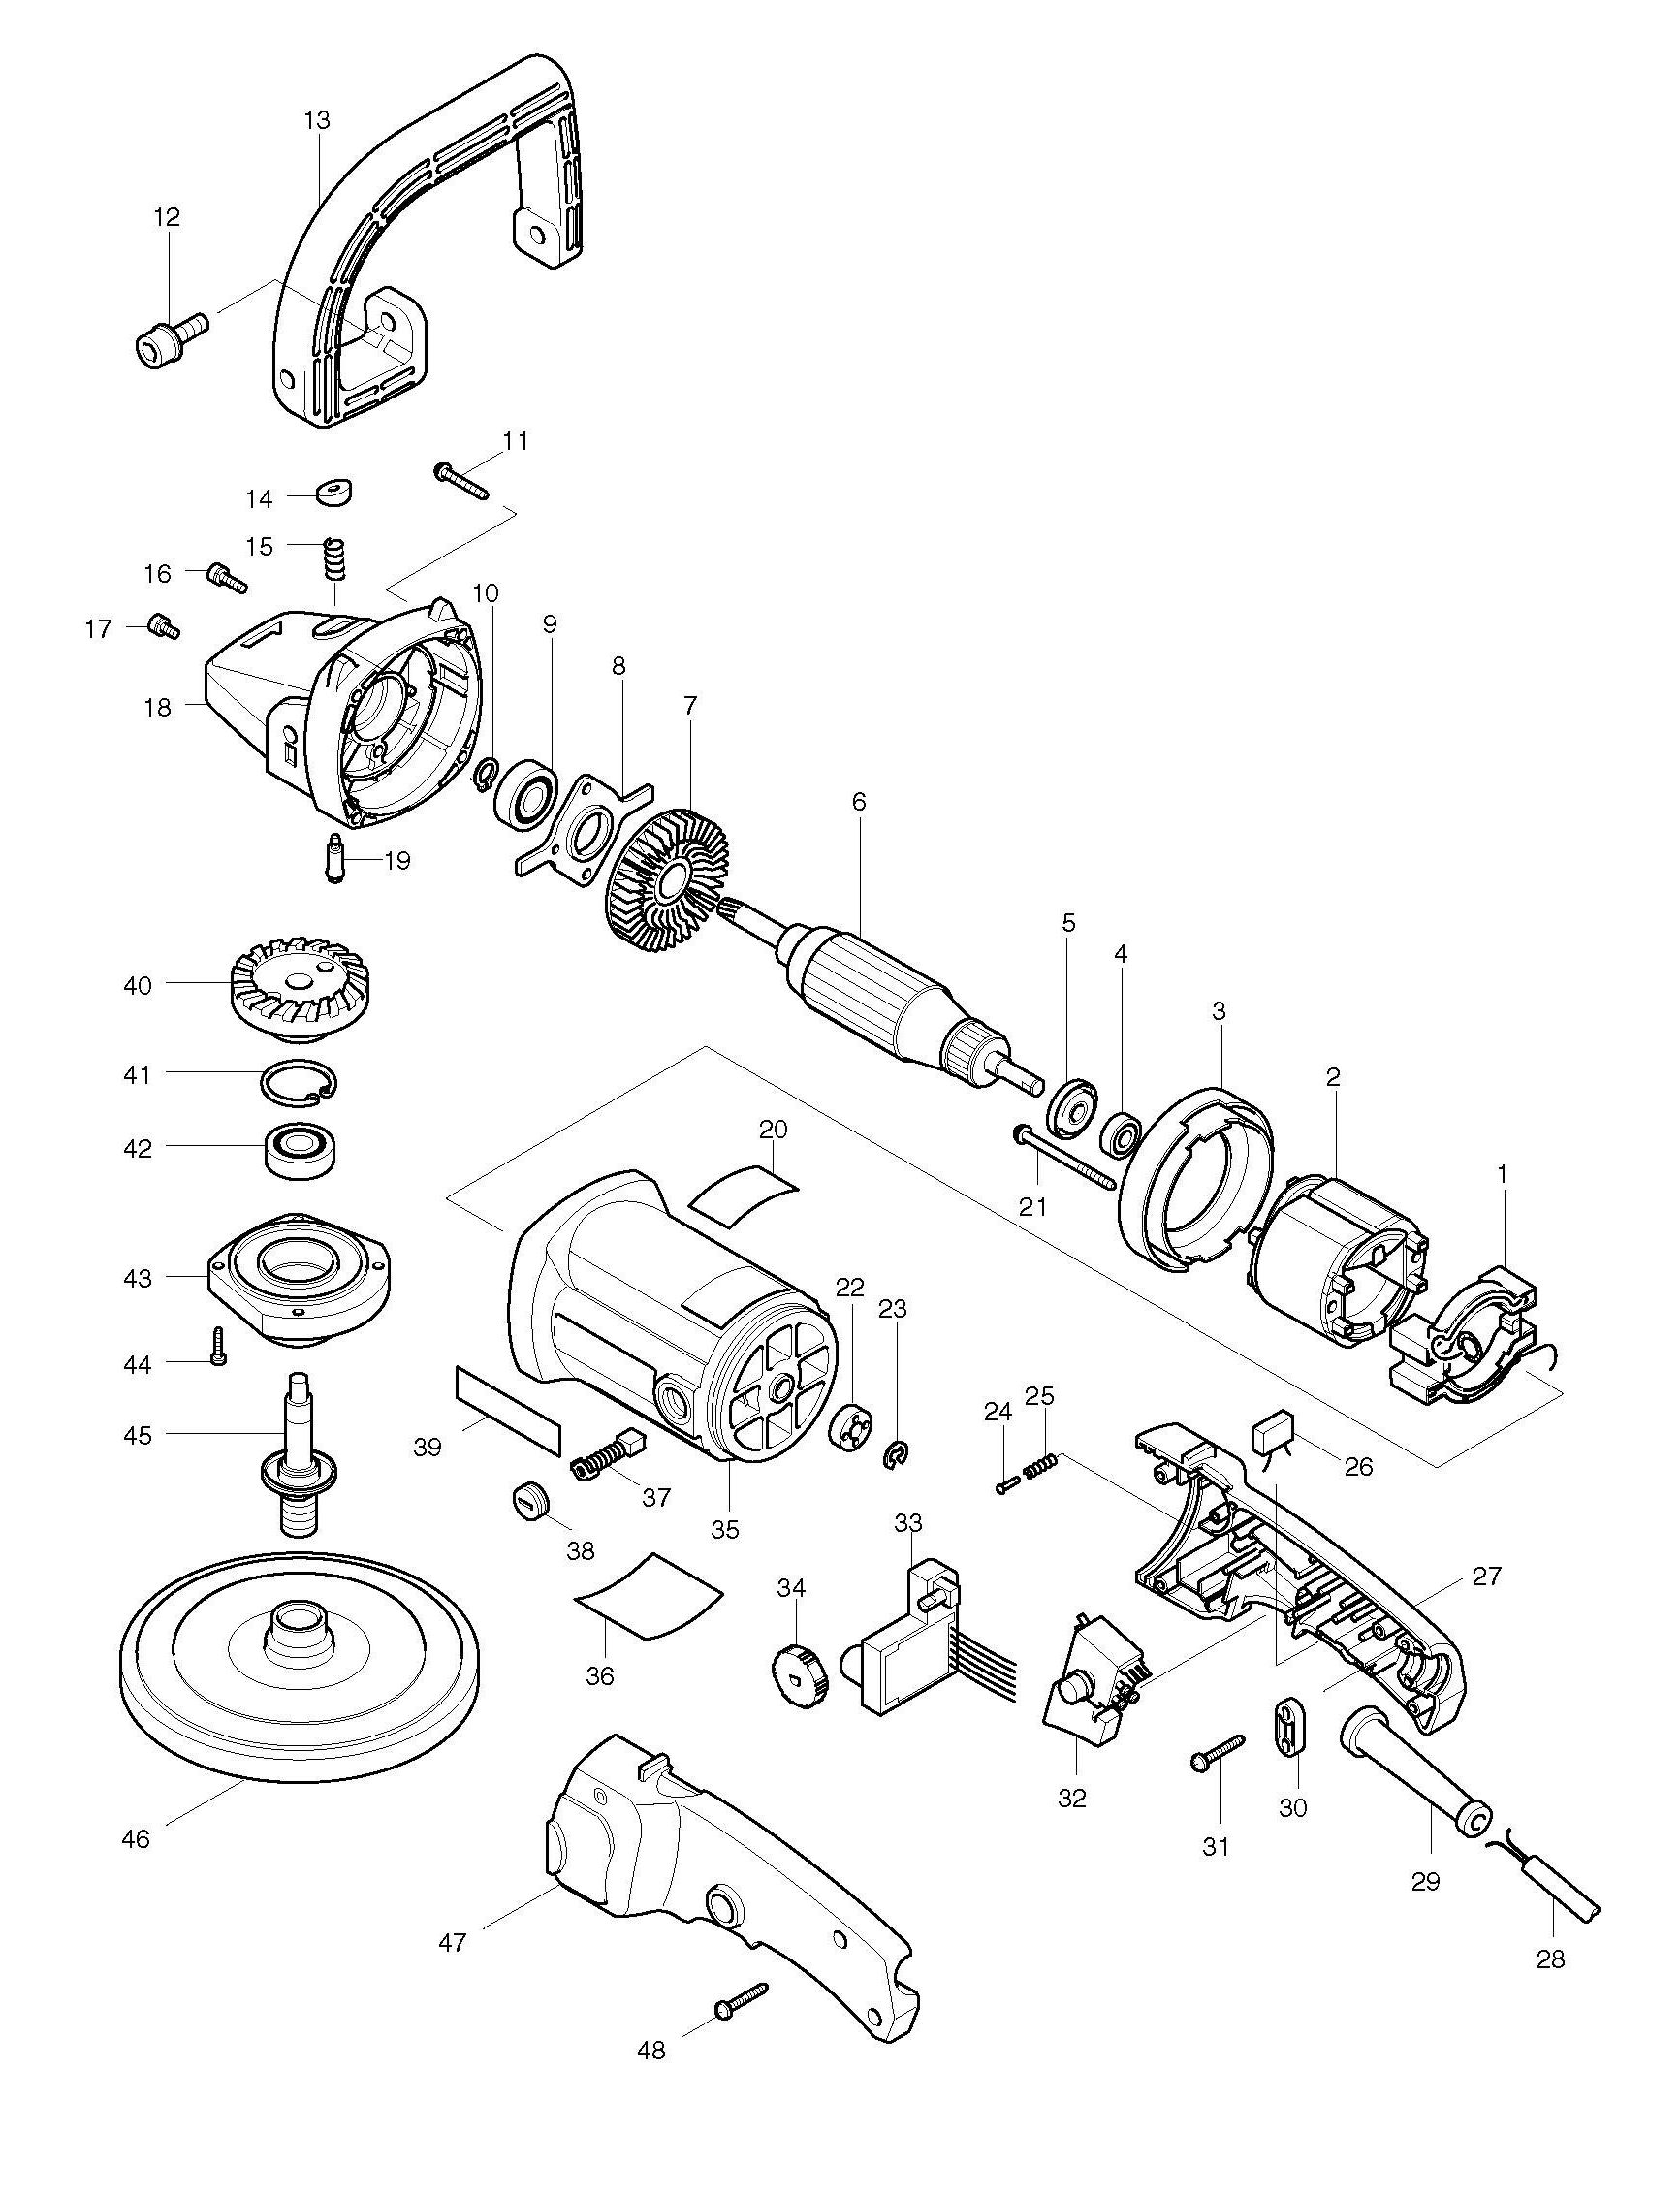 Spares For Makita Cb Sander Polisher 180mm Spare